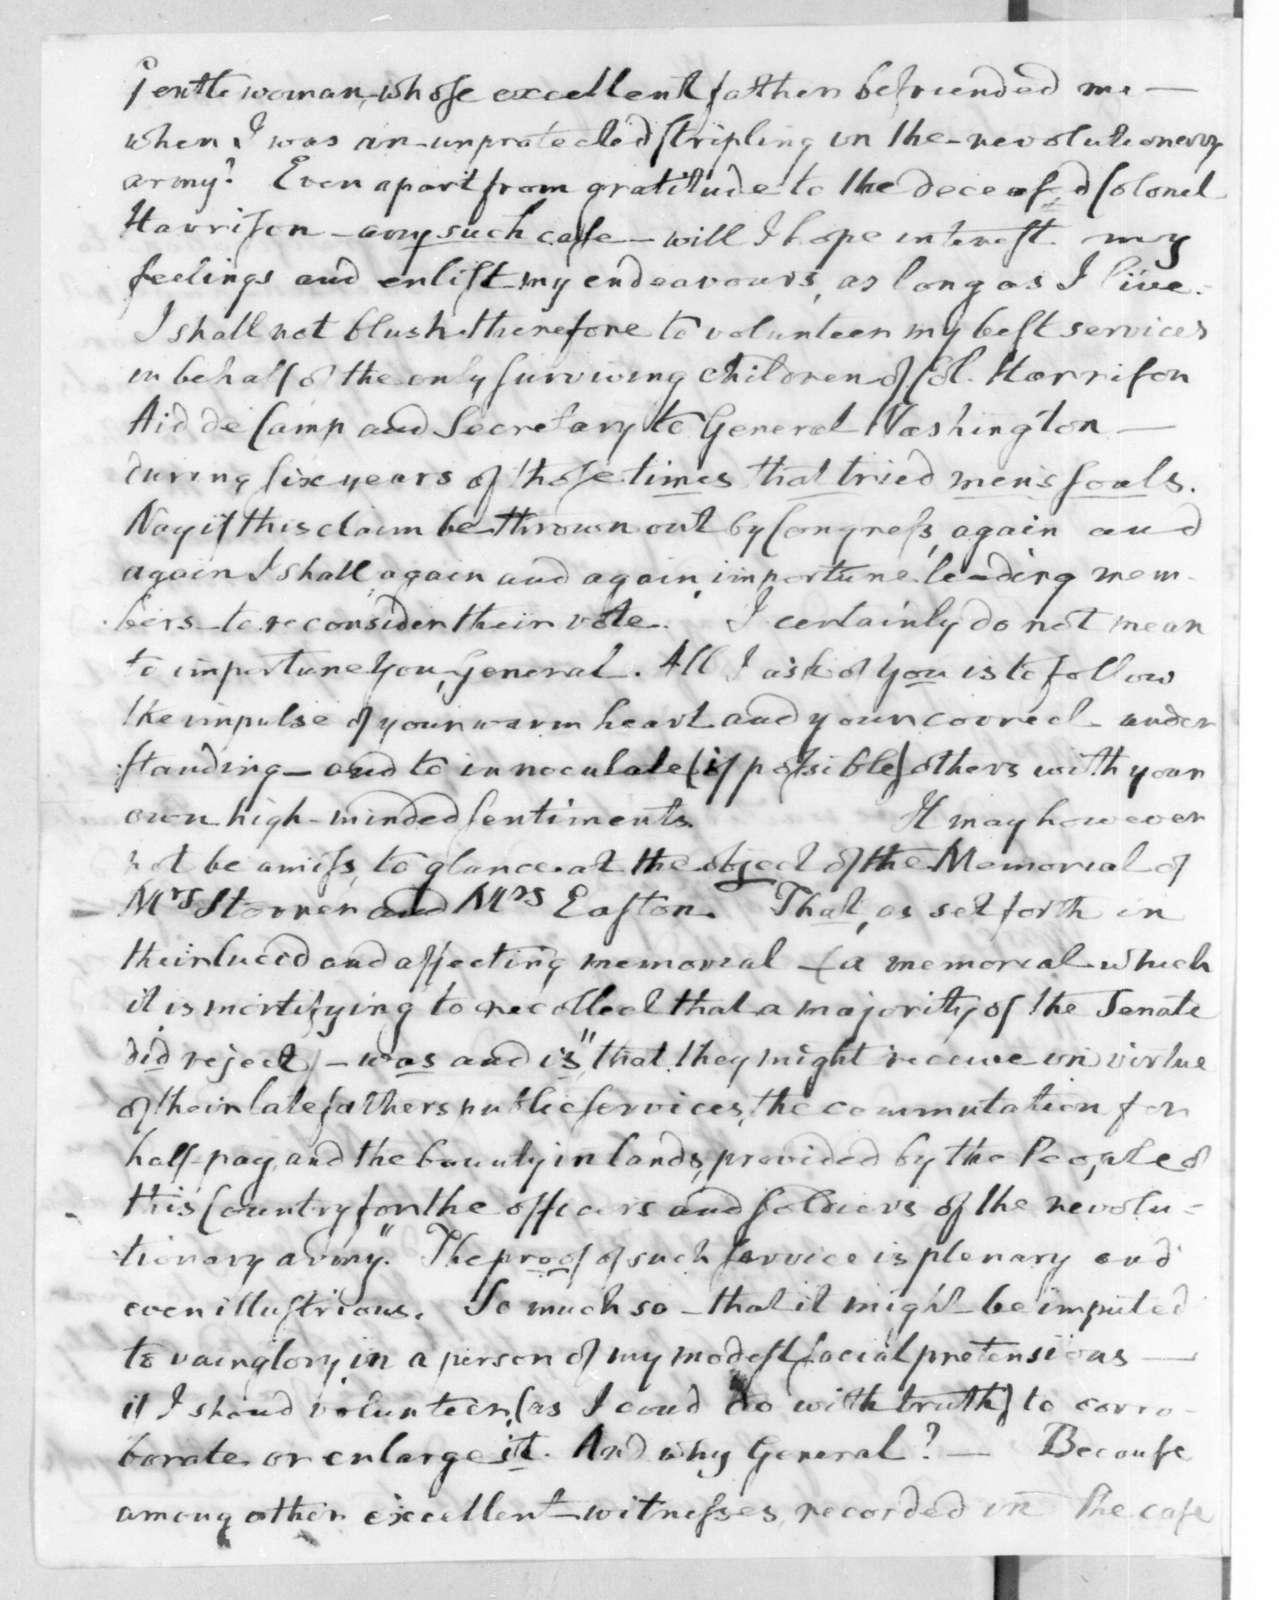 John Browne Cutting to Andrew Jackson, October 24, 1825